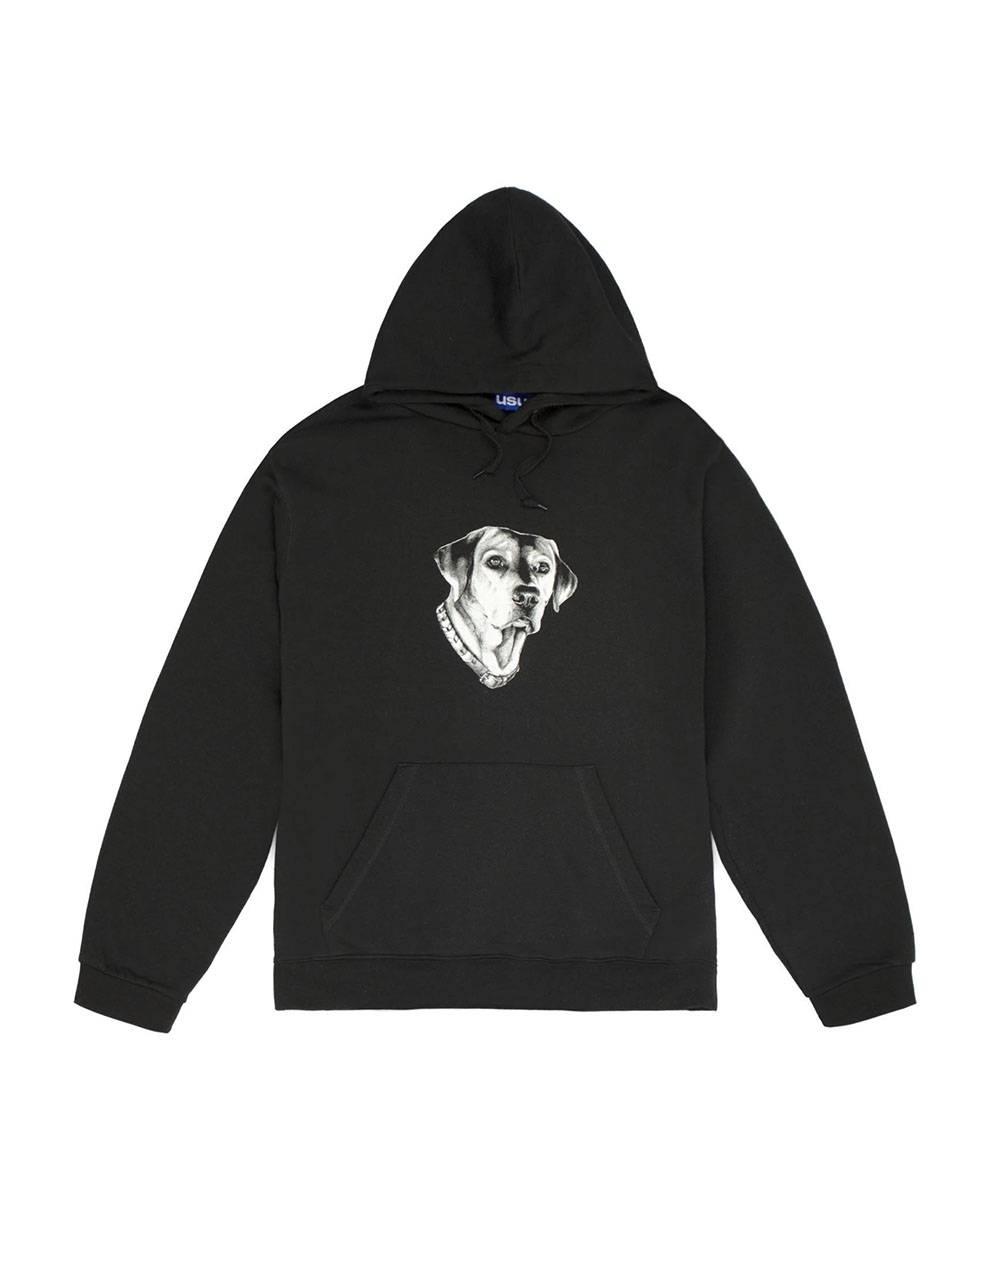 Usual Dogs Hooded Sweatshirt - black Usual Sweater 78,69€